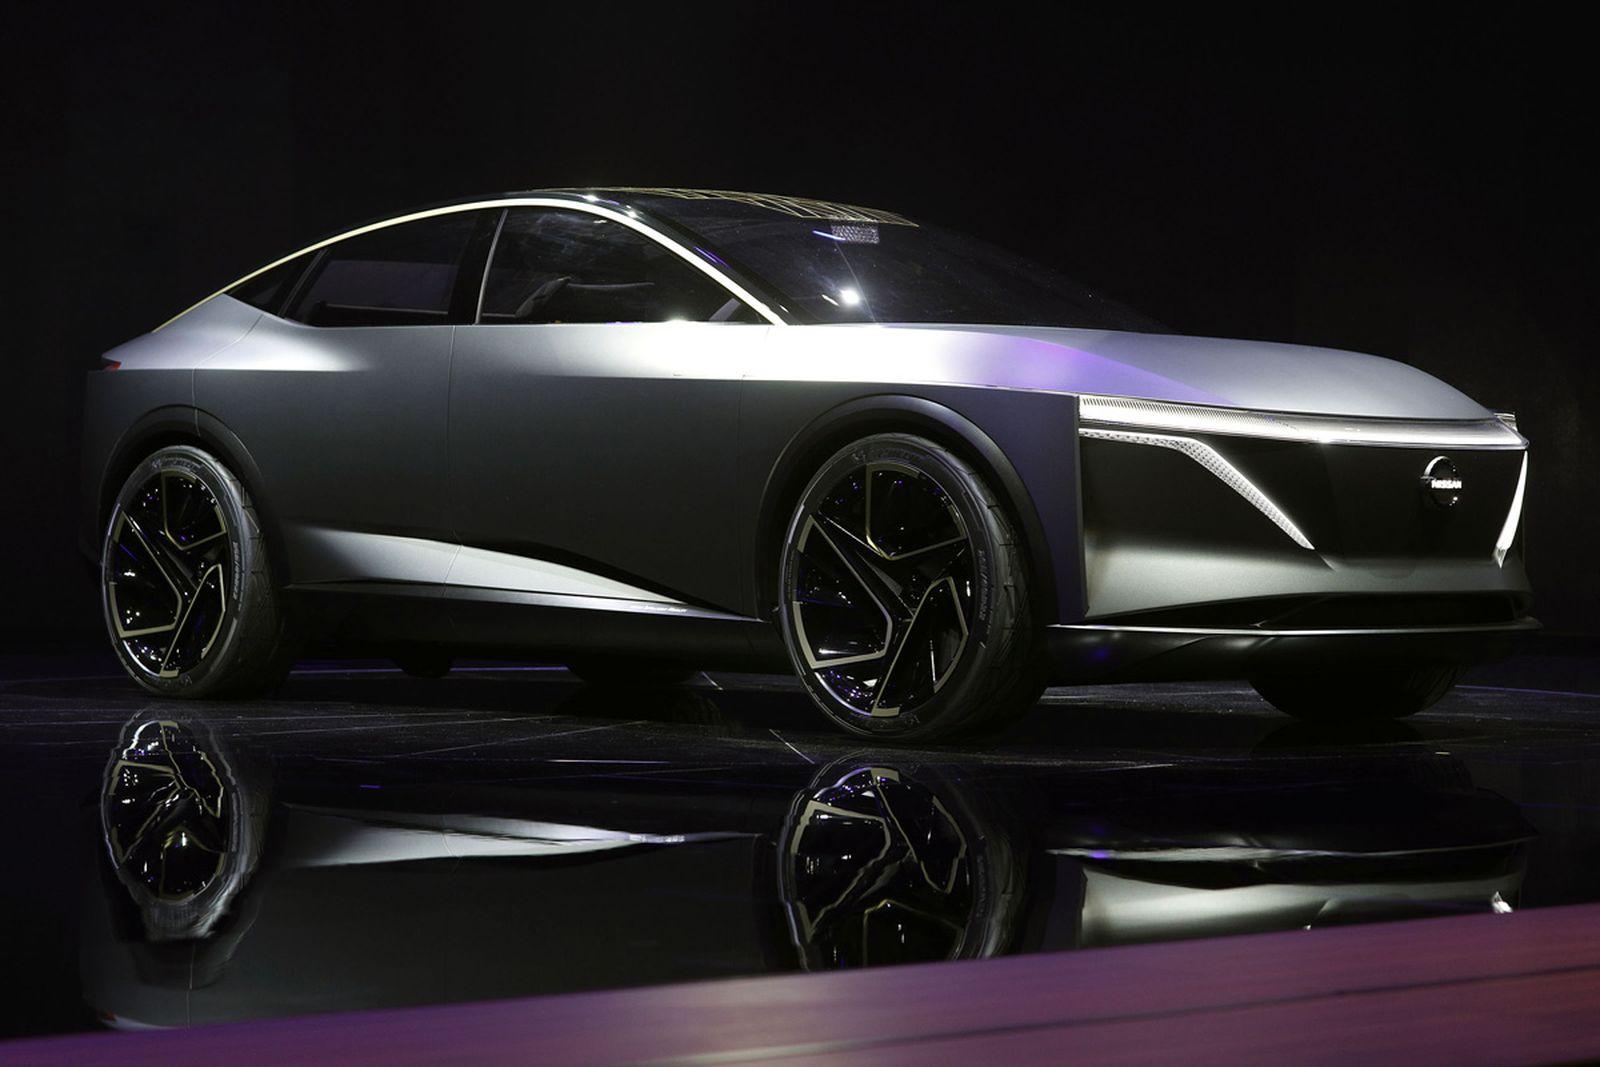 nissan im5 Inifiniti Lexus detroit auto show